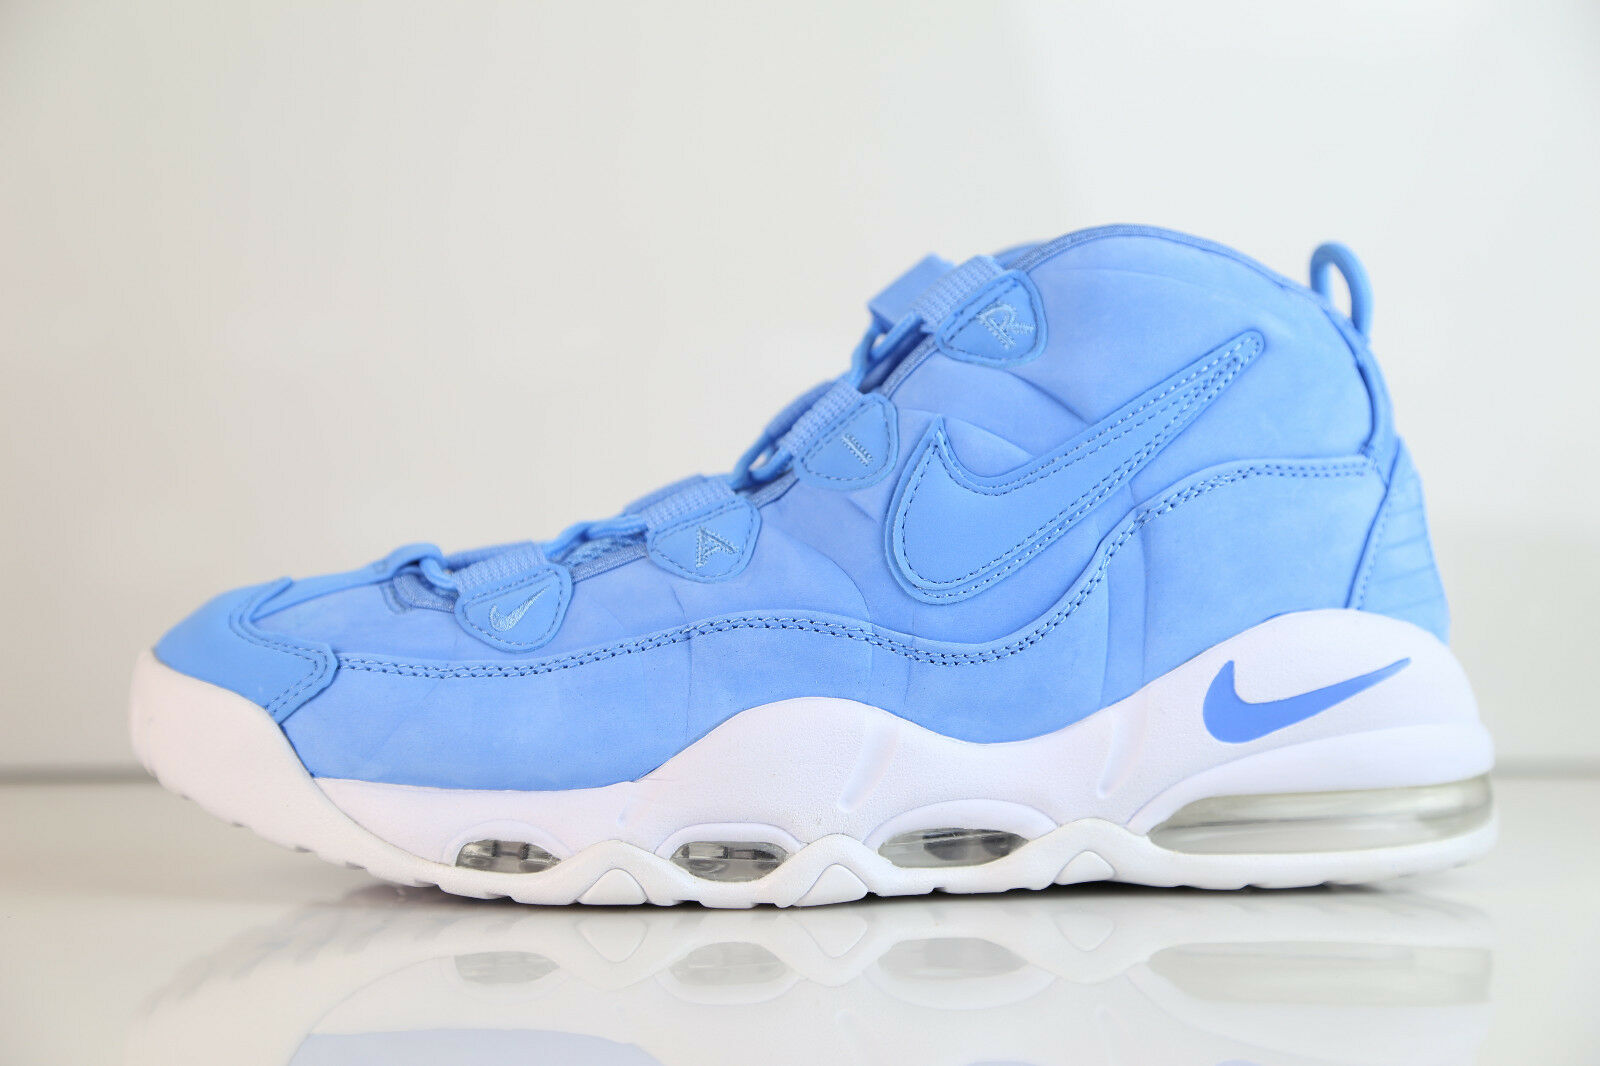 Nike Air Max Uptempo 95 AS QS Pantone University bluee 922932-400 8-11 7 3 more